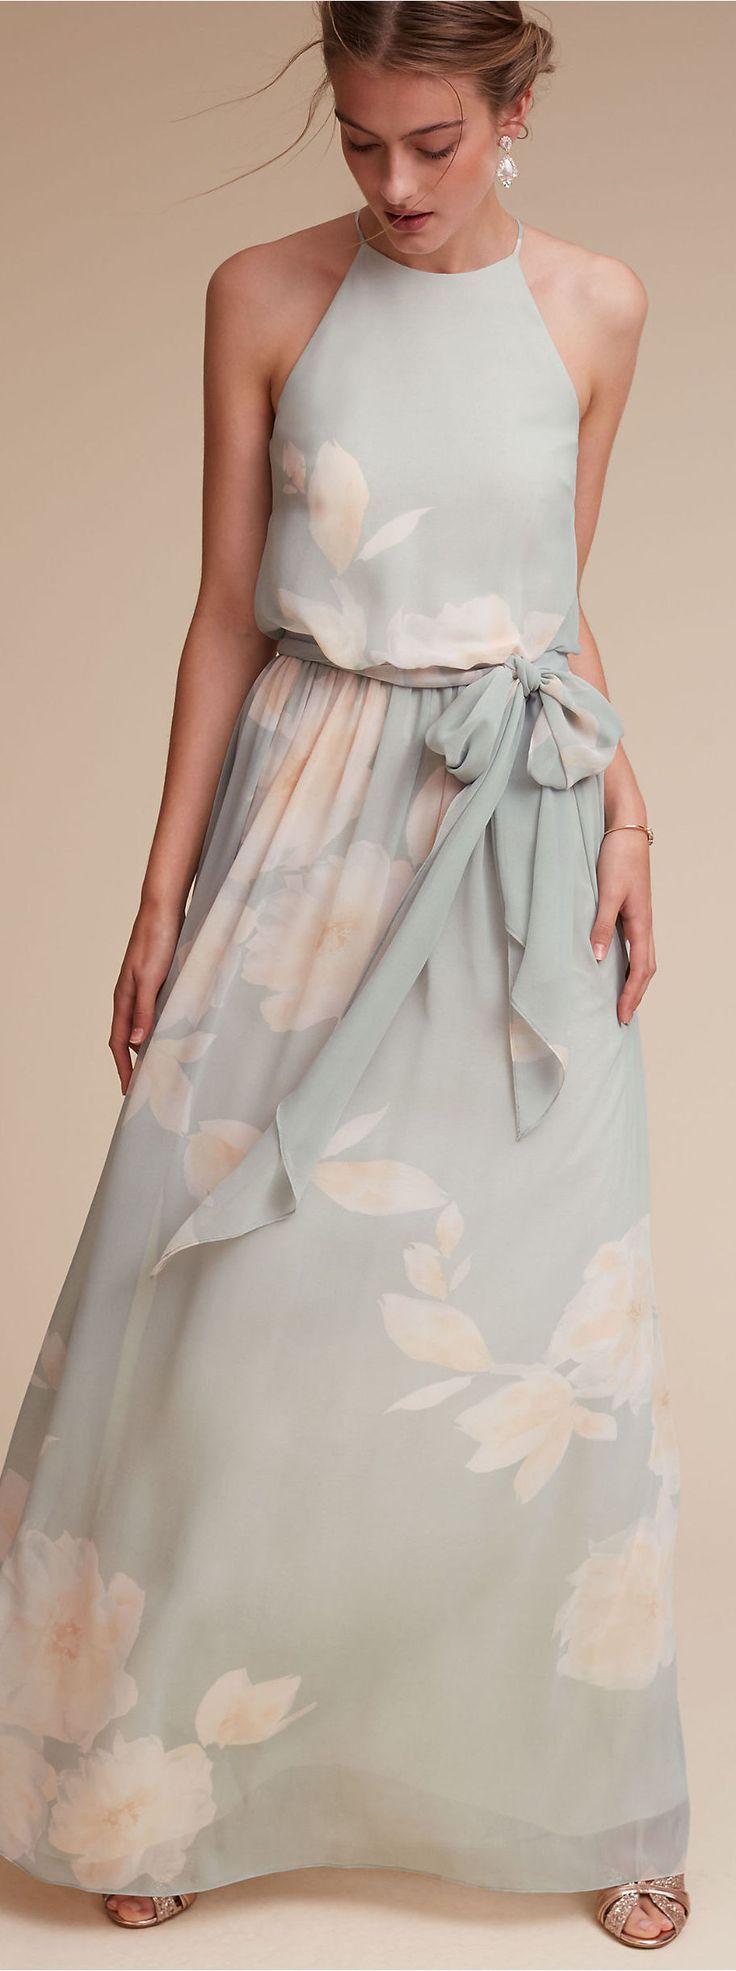 Pastel Floral Bridesmaid Dress  BHLDN  Abiti, Abiti estivi